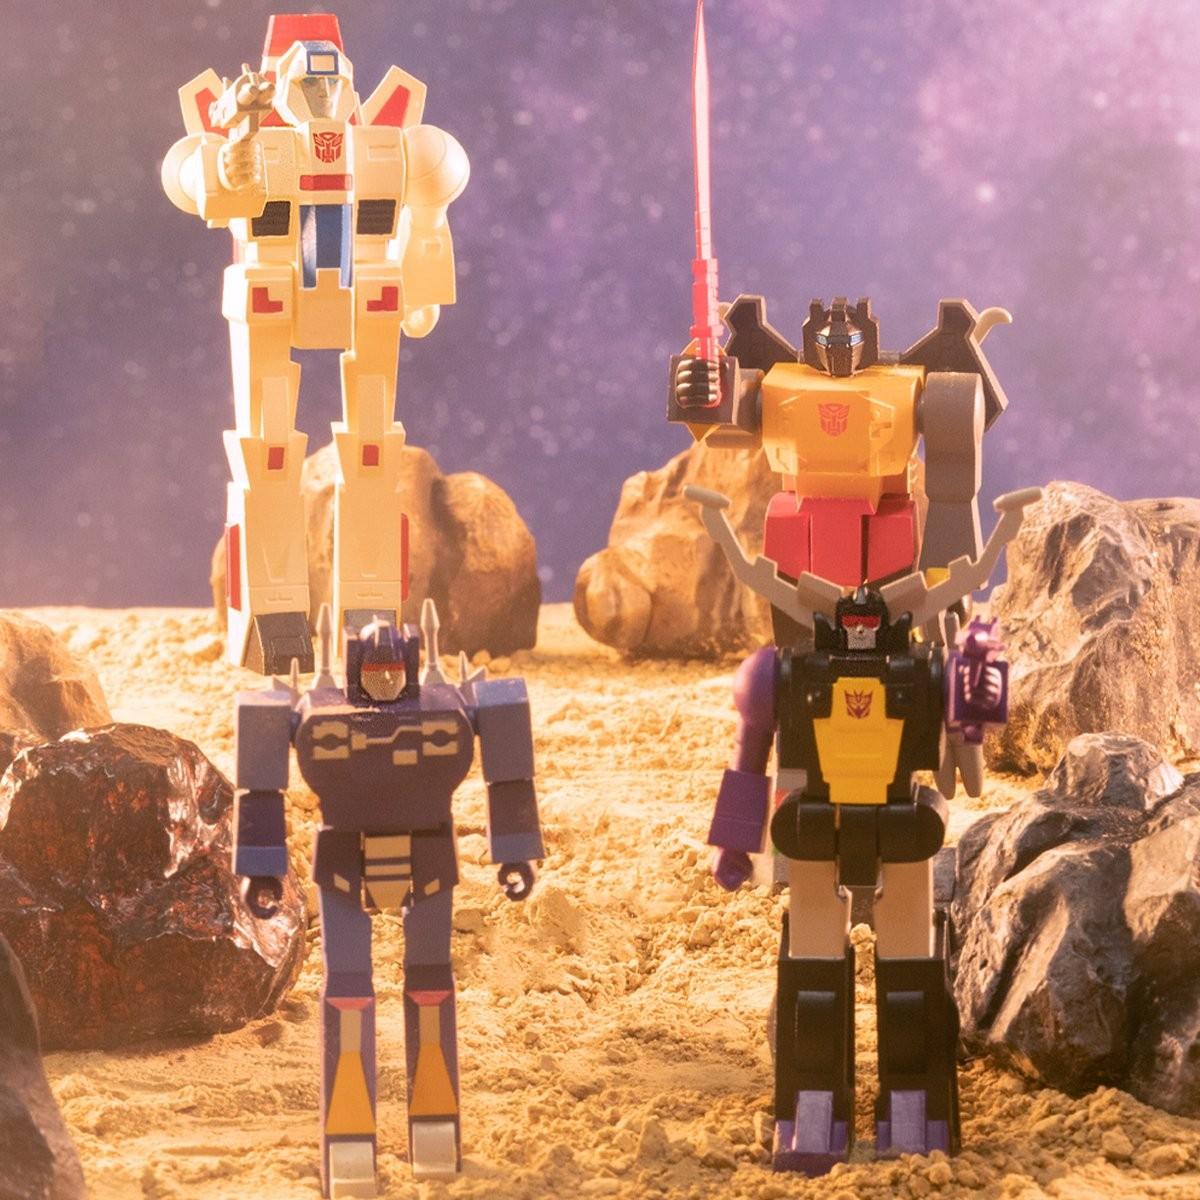 Transformers News: New Super7 Transformers ReAction Figures Revealed - Grimlock, Skyfire, Rumble, Shrapnel